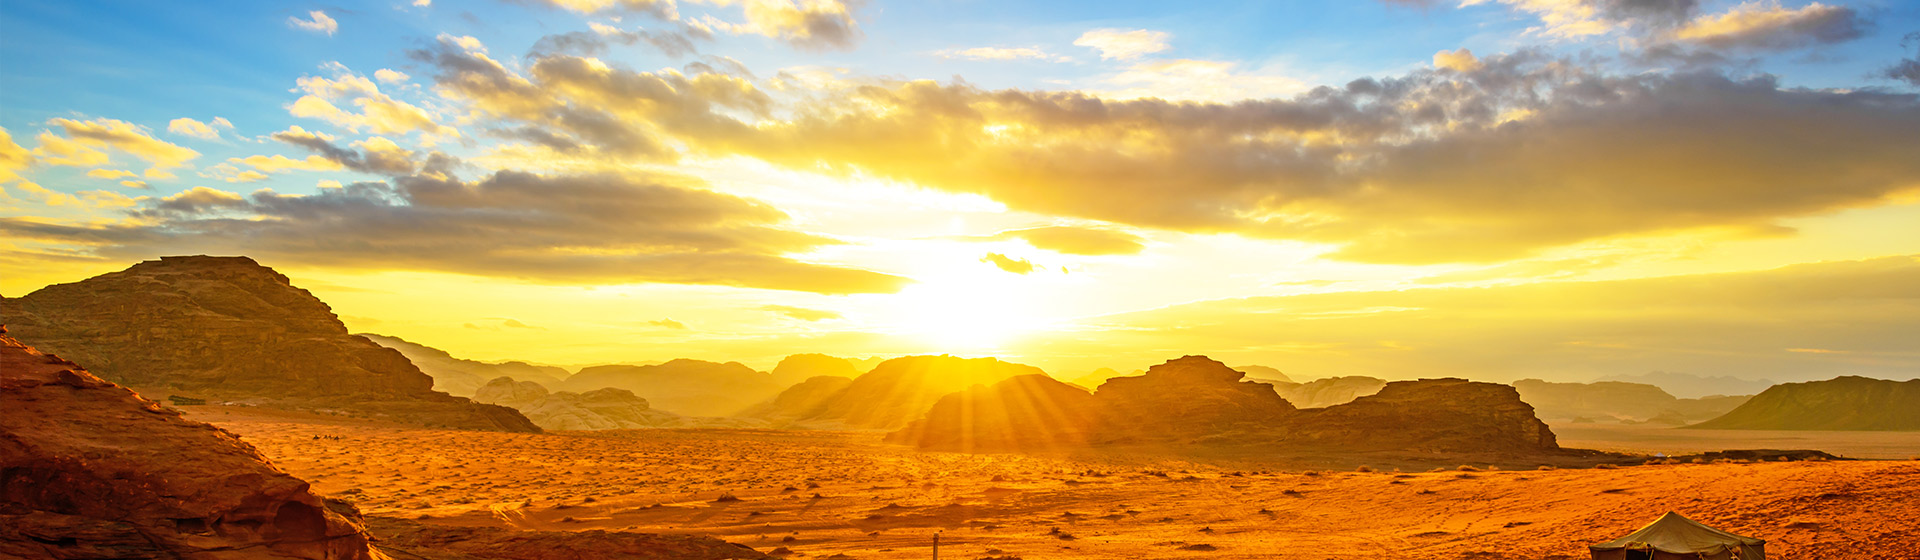 Jordania Fascinadora, Wadi Rum y Mar Muerto